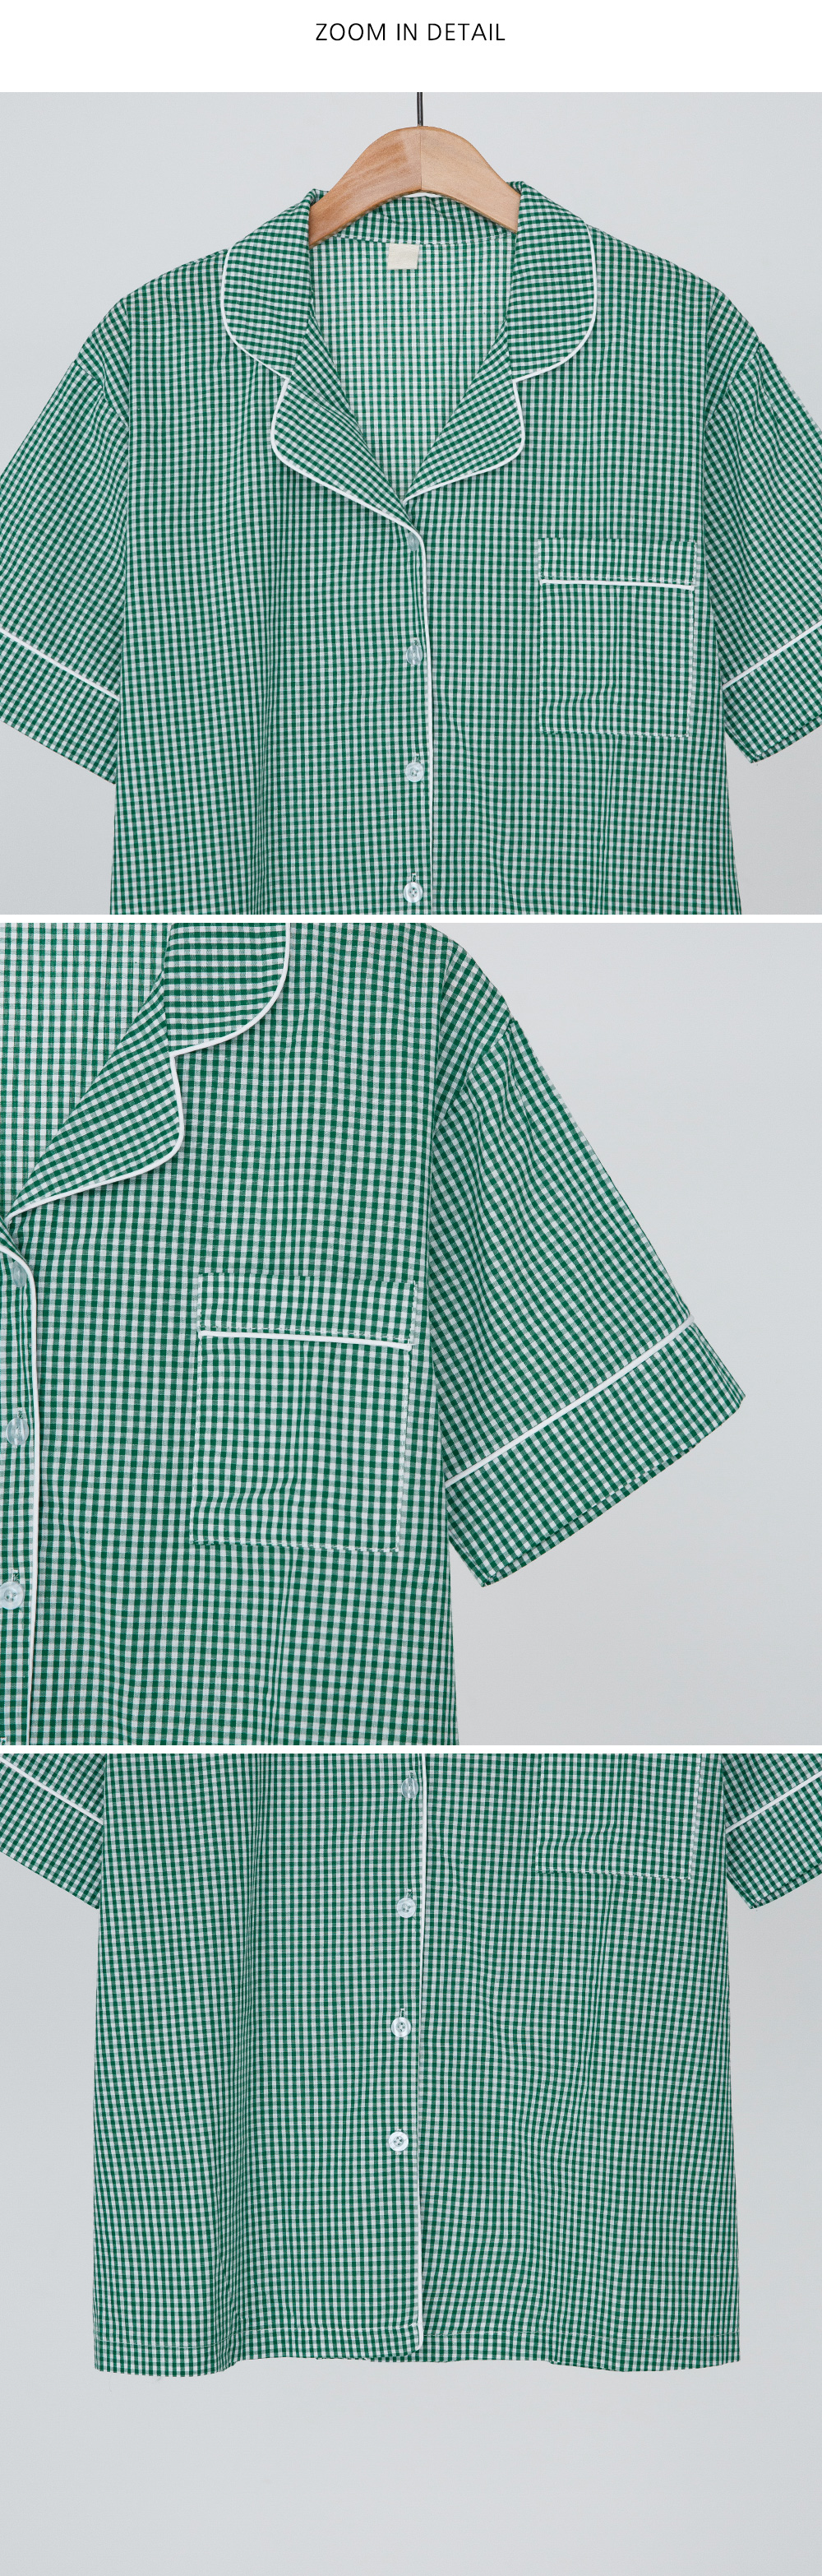 boxy fit check pajamas